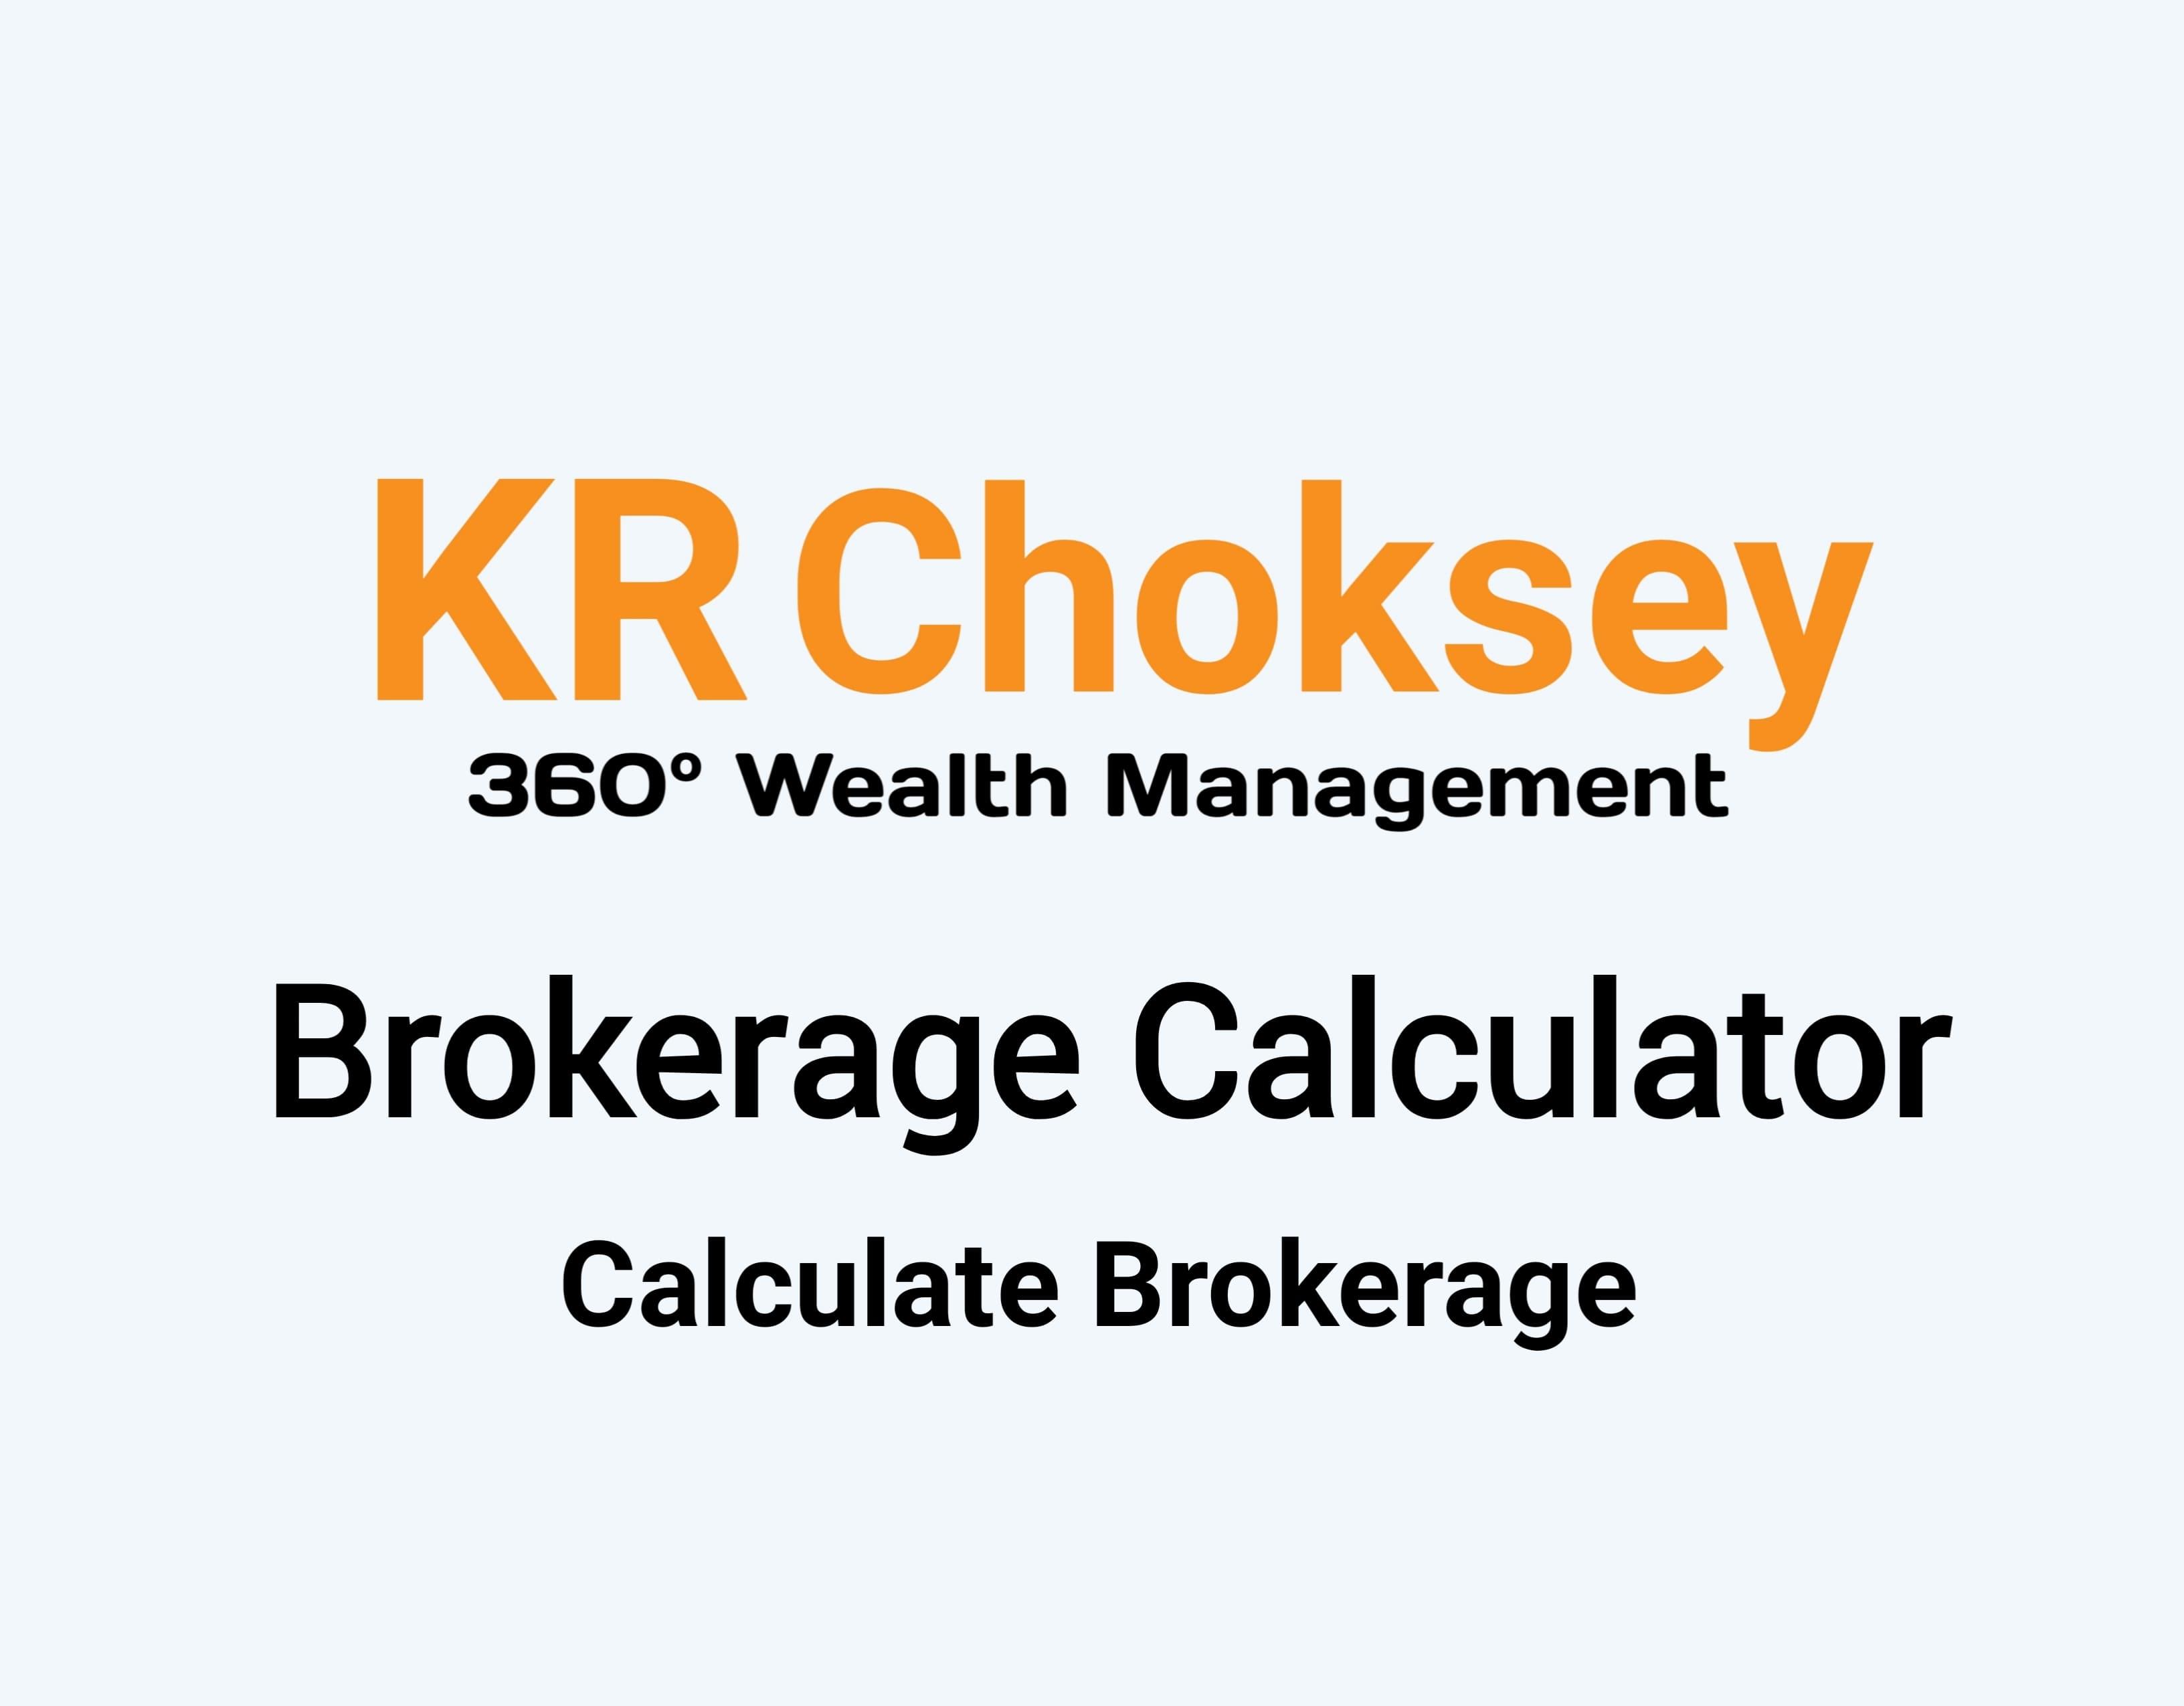 KR Choksey Brokerage Calculator